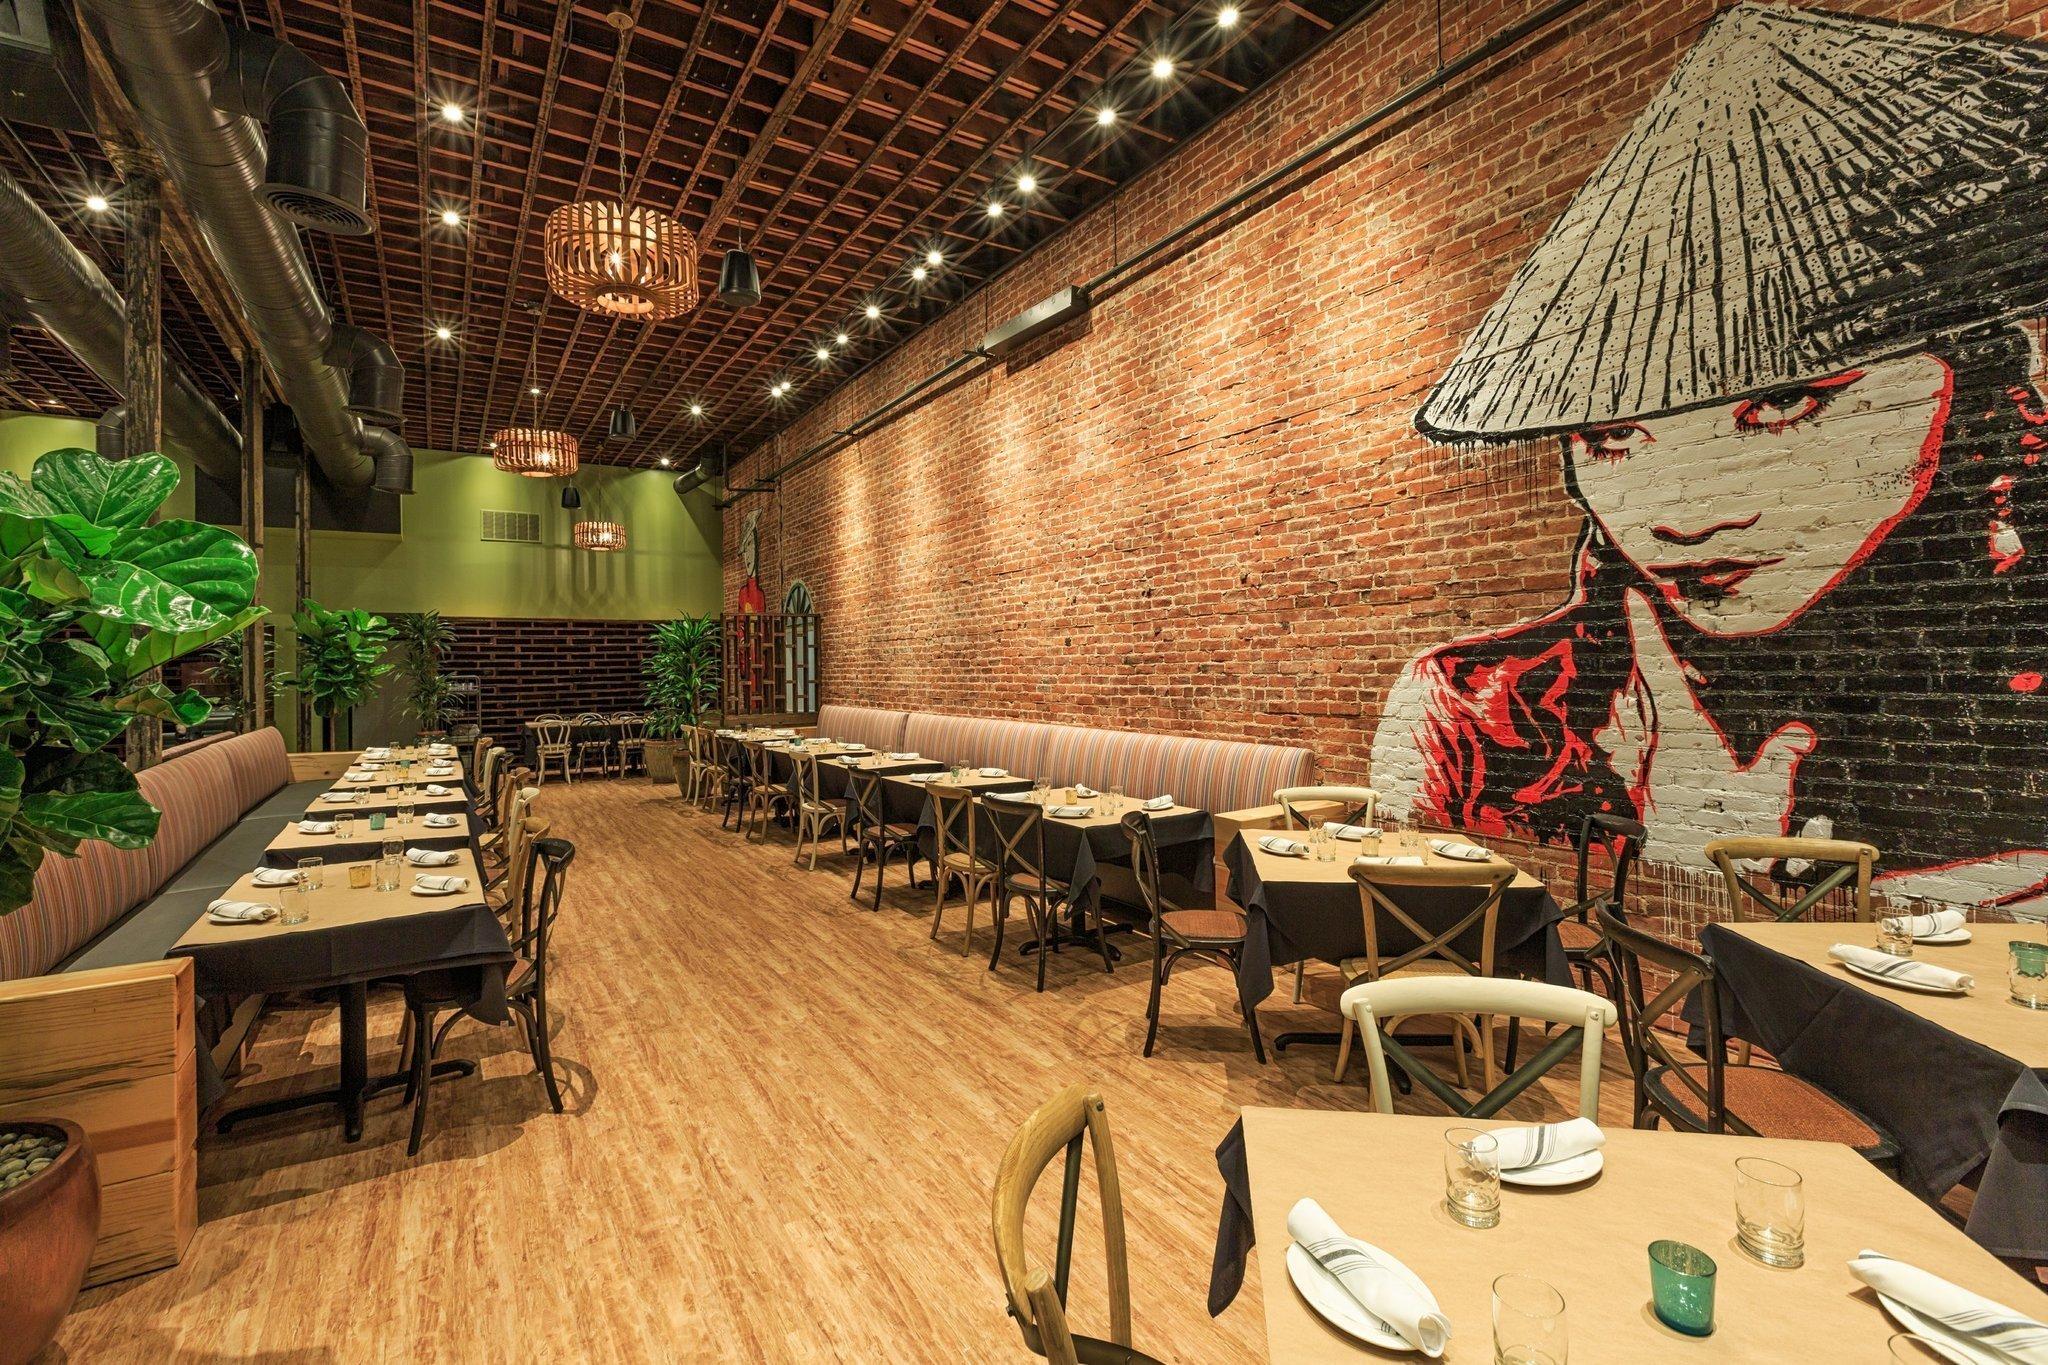 Huynh S Kitchen Menu